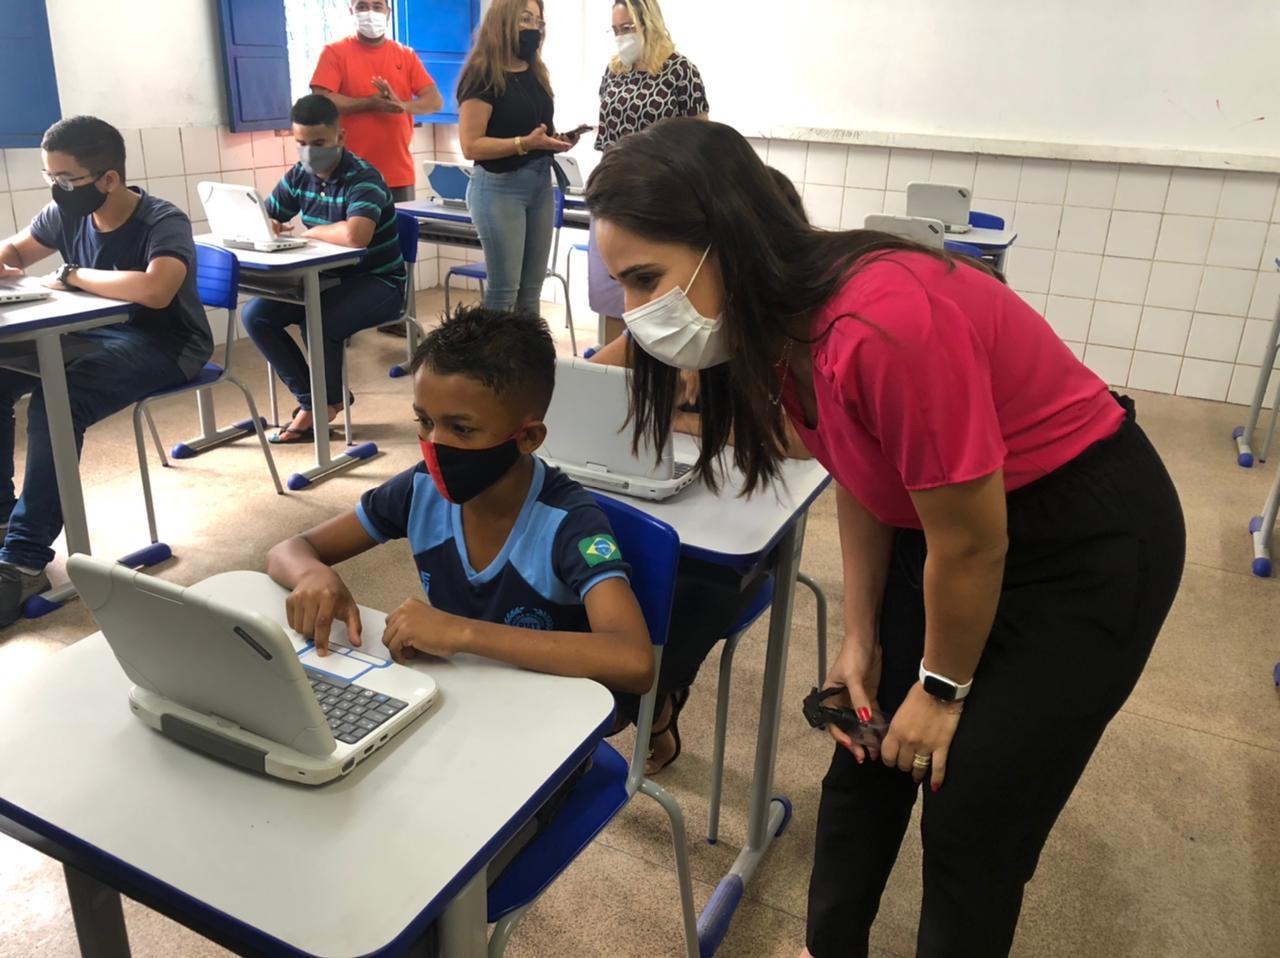 Vereadora Elzuila Calisto (PT), durante visita à Unidade Escolar Santa Filomena